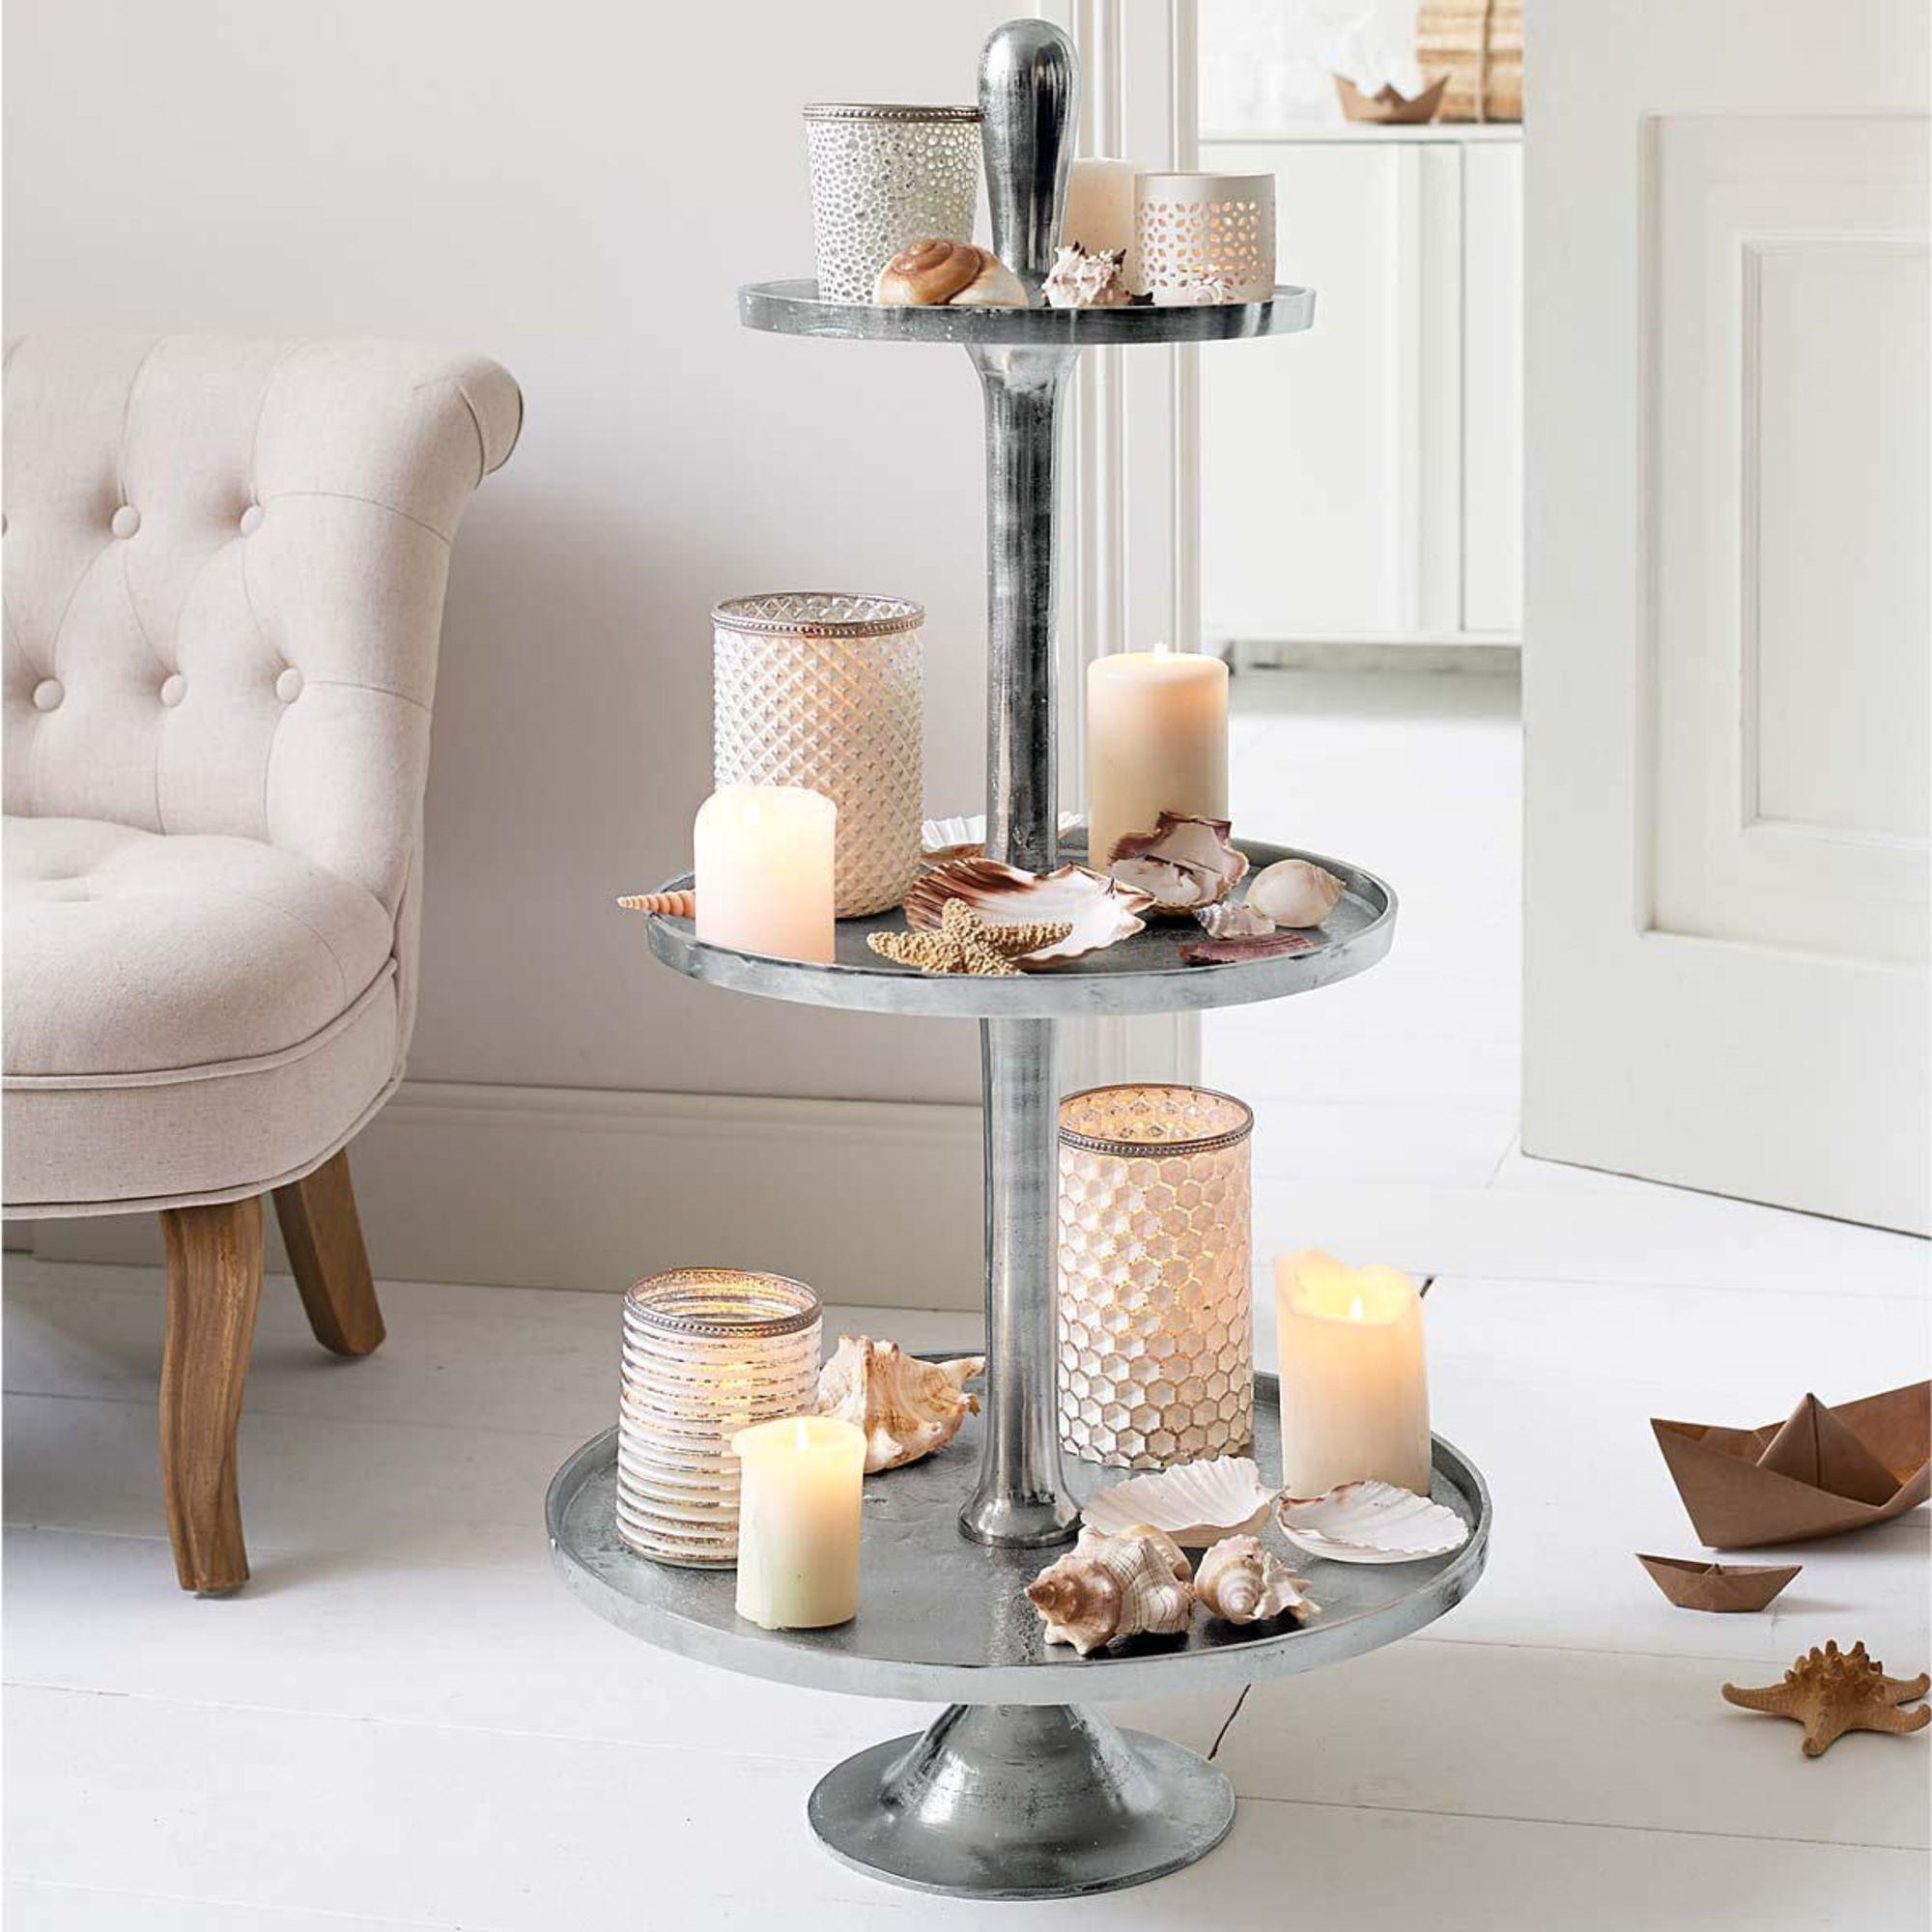 deko etagere nobel h95cm xxl metall empfangsbereich etagenturm dekoturm turm ebay. Black Bedroom Furniture Sets. Home Design Ideas